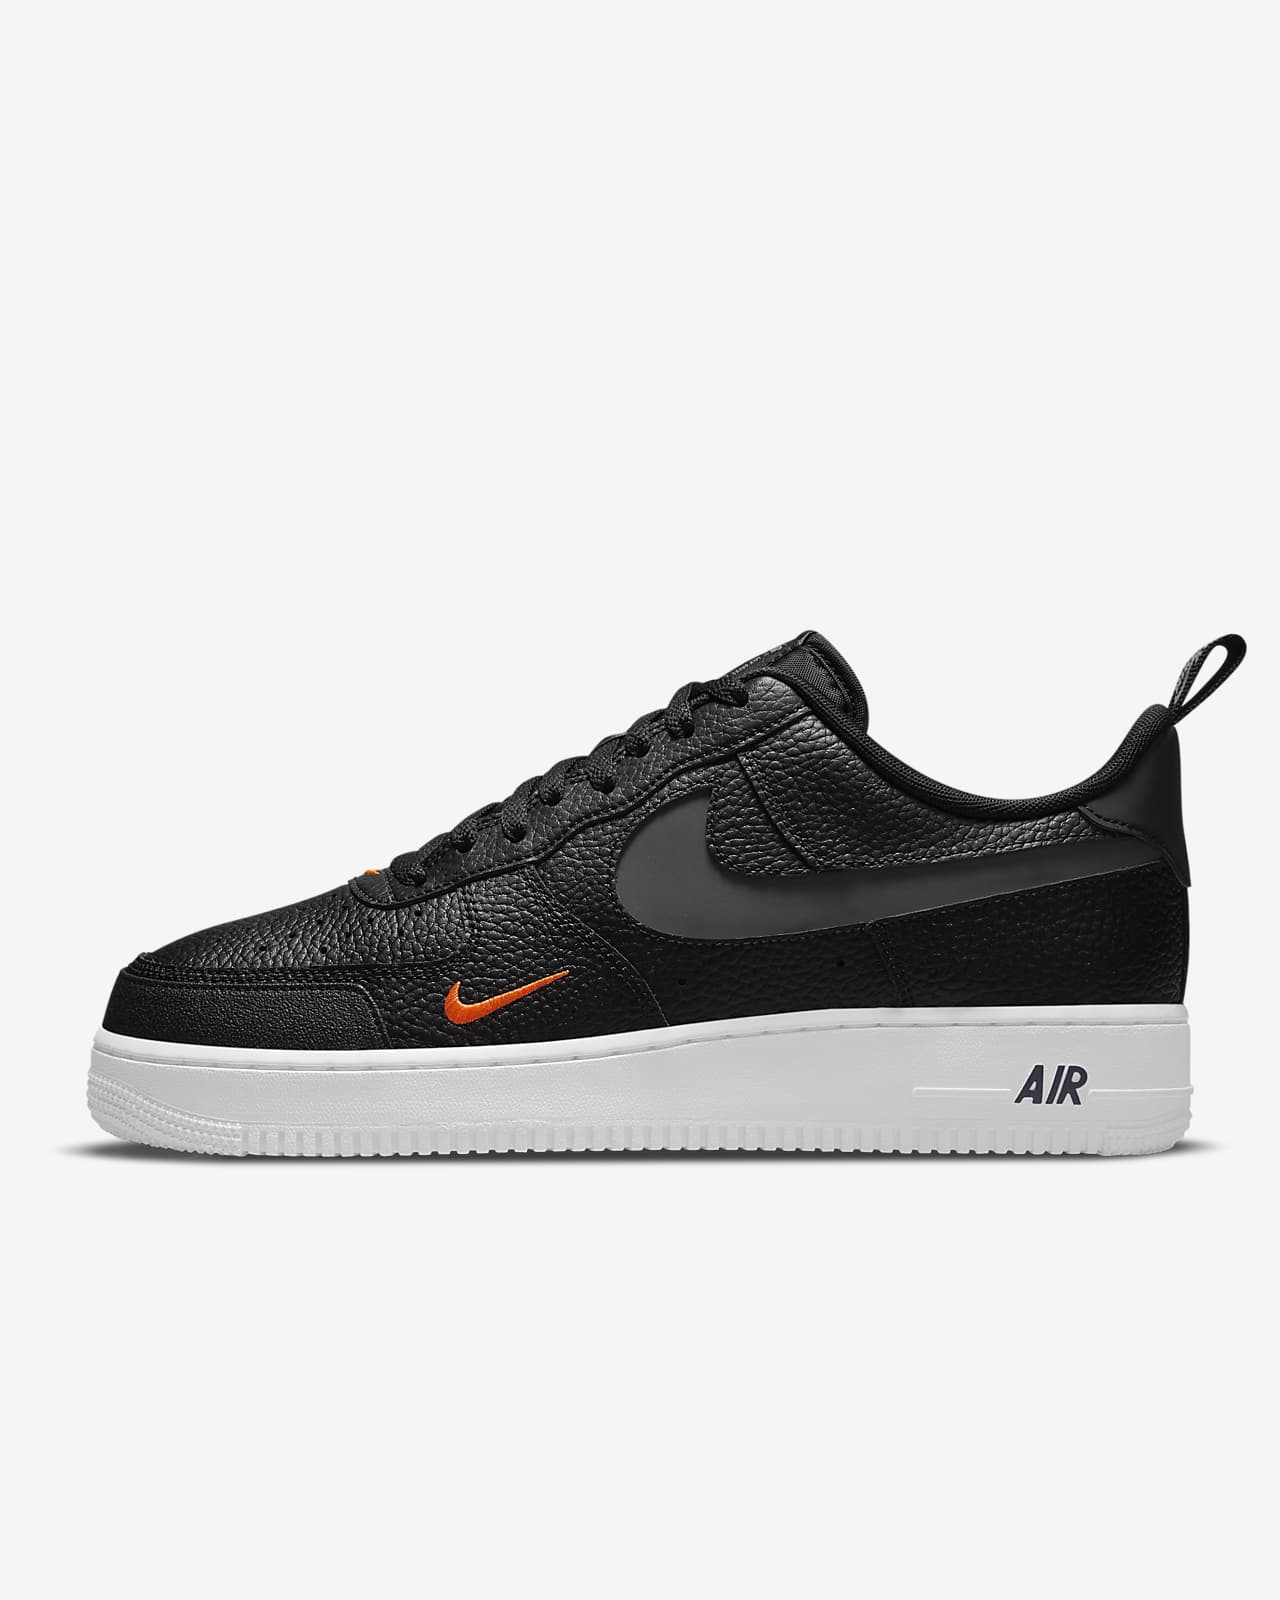 Nike Air Force 1 LV8 Herrenschuh